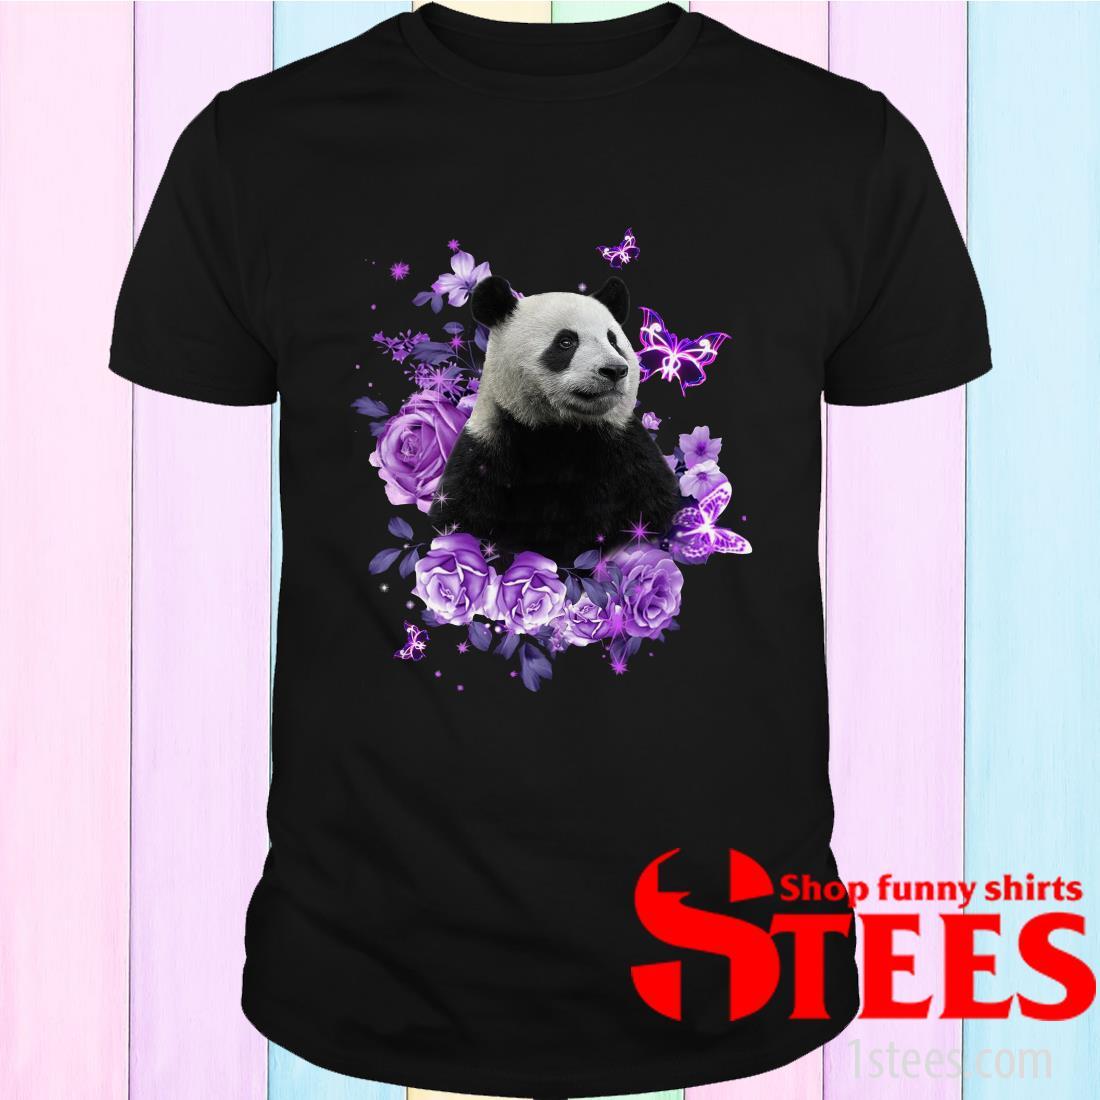 Panda Purple Flowers ShirtPanda Purple Flowers Shirt